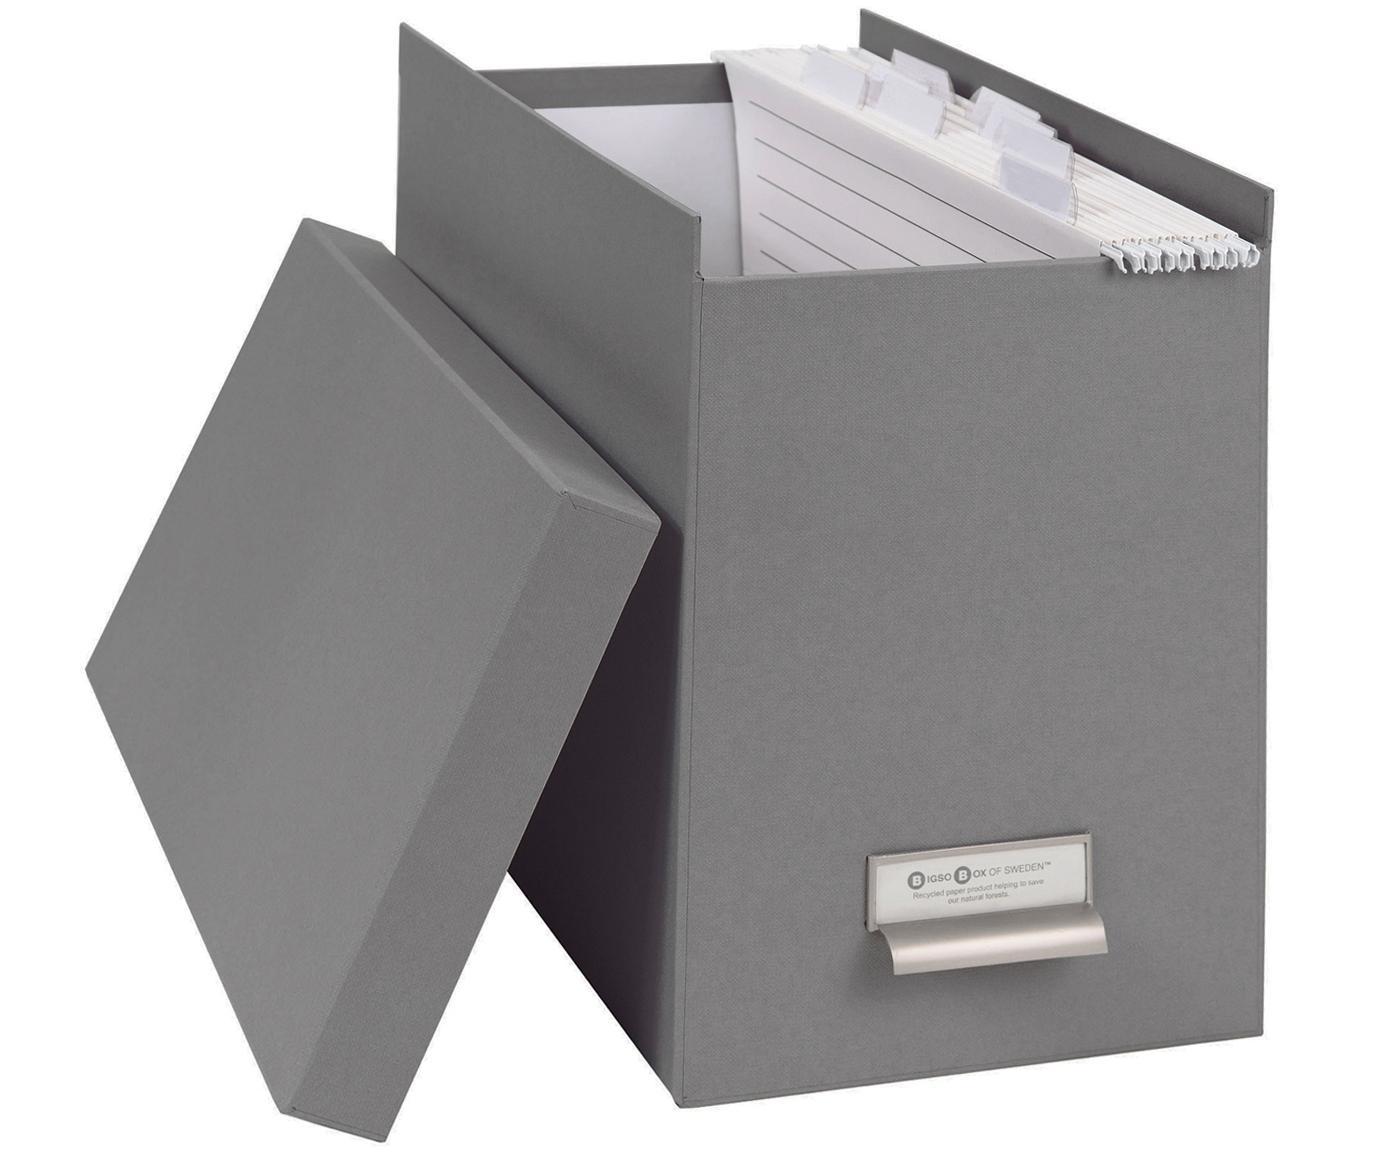 Archiefdoos Johan, 9-delig., Organizer: stevig gelamineerd karton, Organizer buitenzijde: lichtgrijs Organizer binnenzijde: wit, 19 x 27 cm